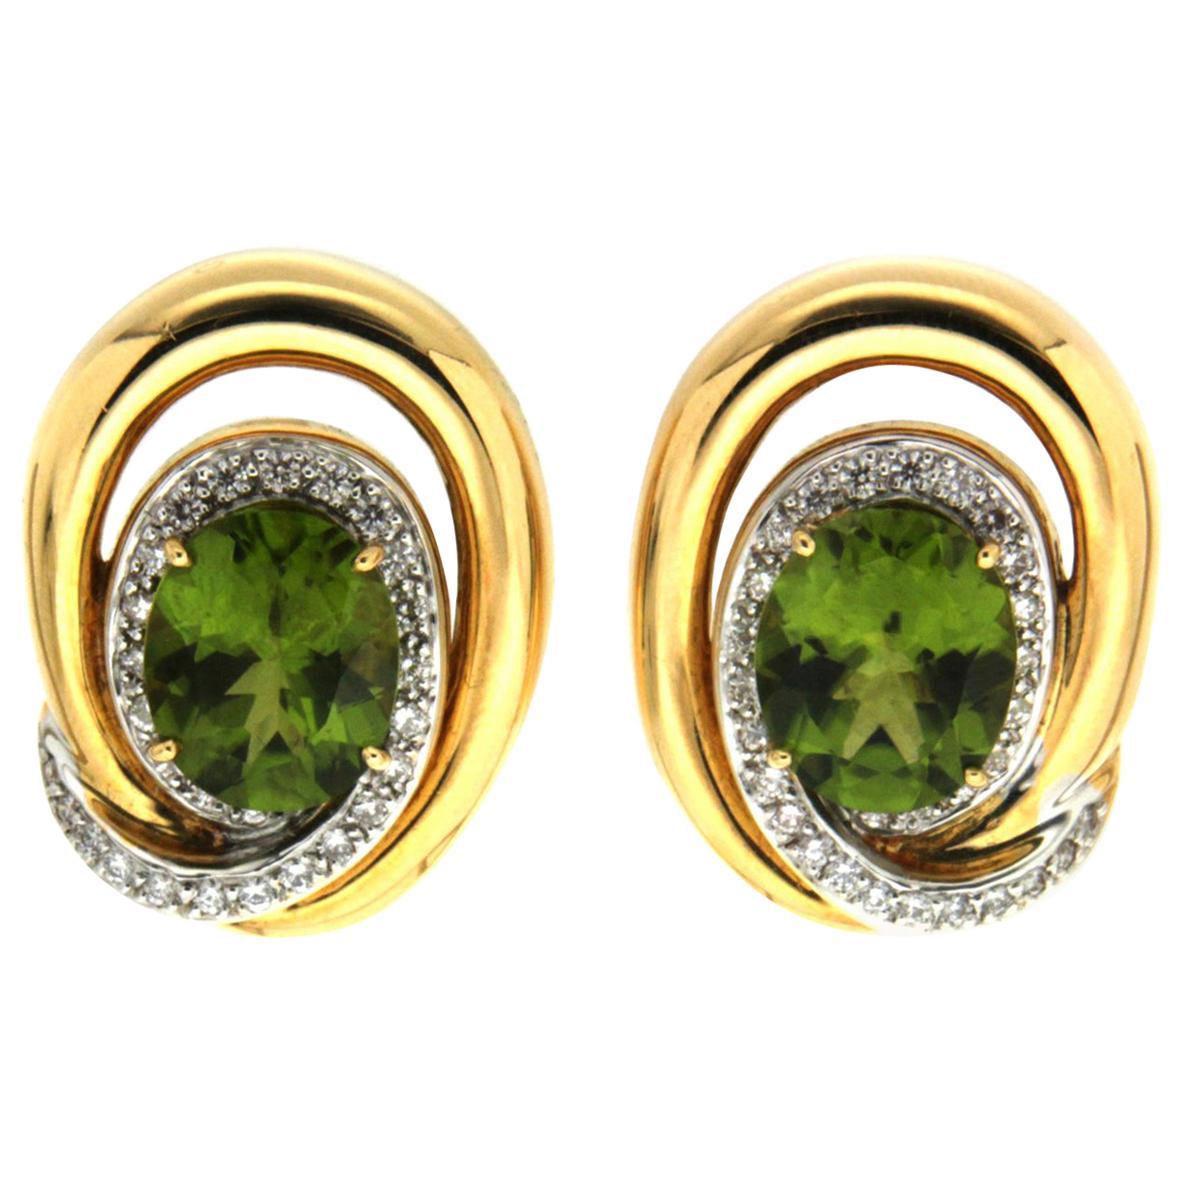 Valentin Magro Openwork Peridot Diamond Swirl Earrings